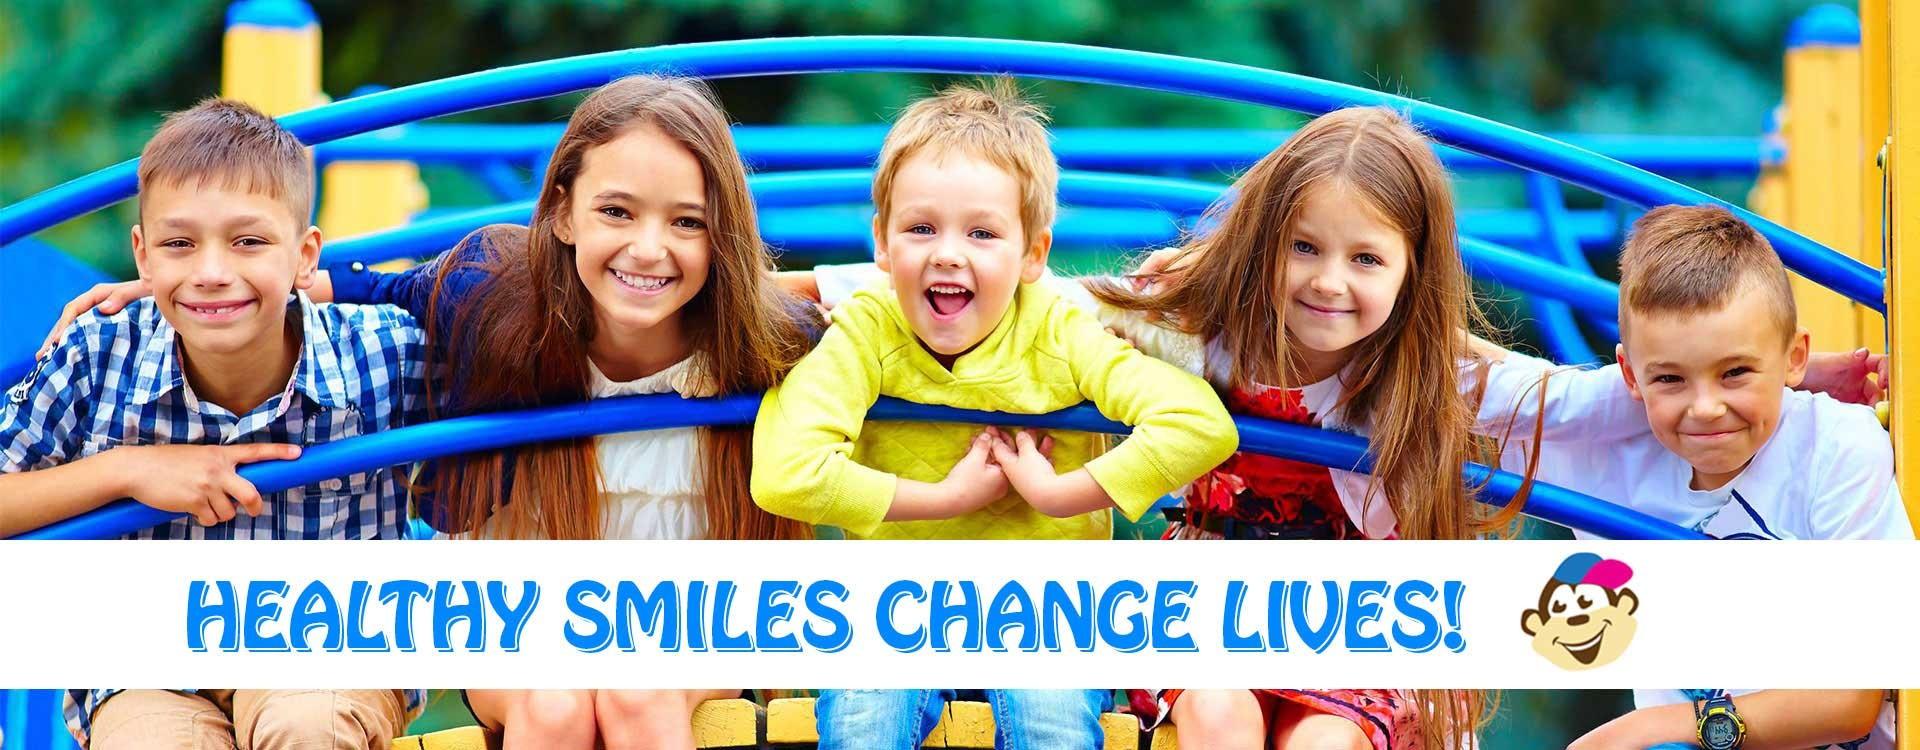 NC Pediatric Dentistry | LinkedIn